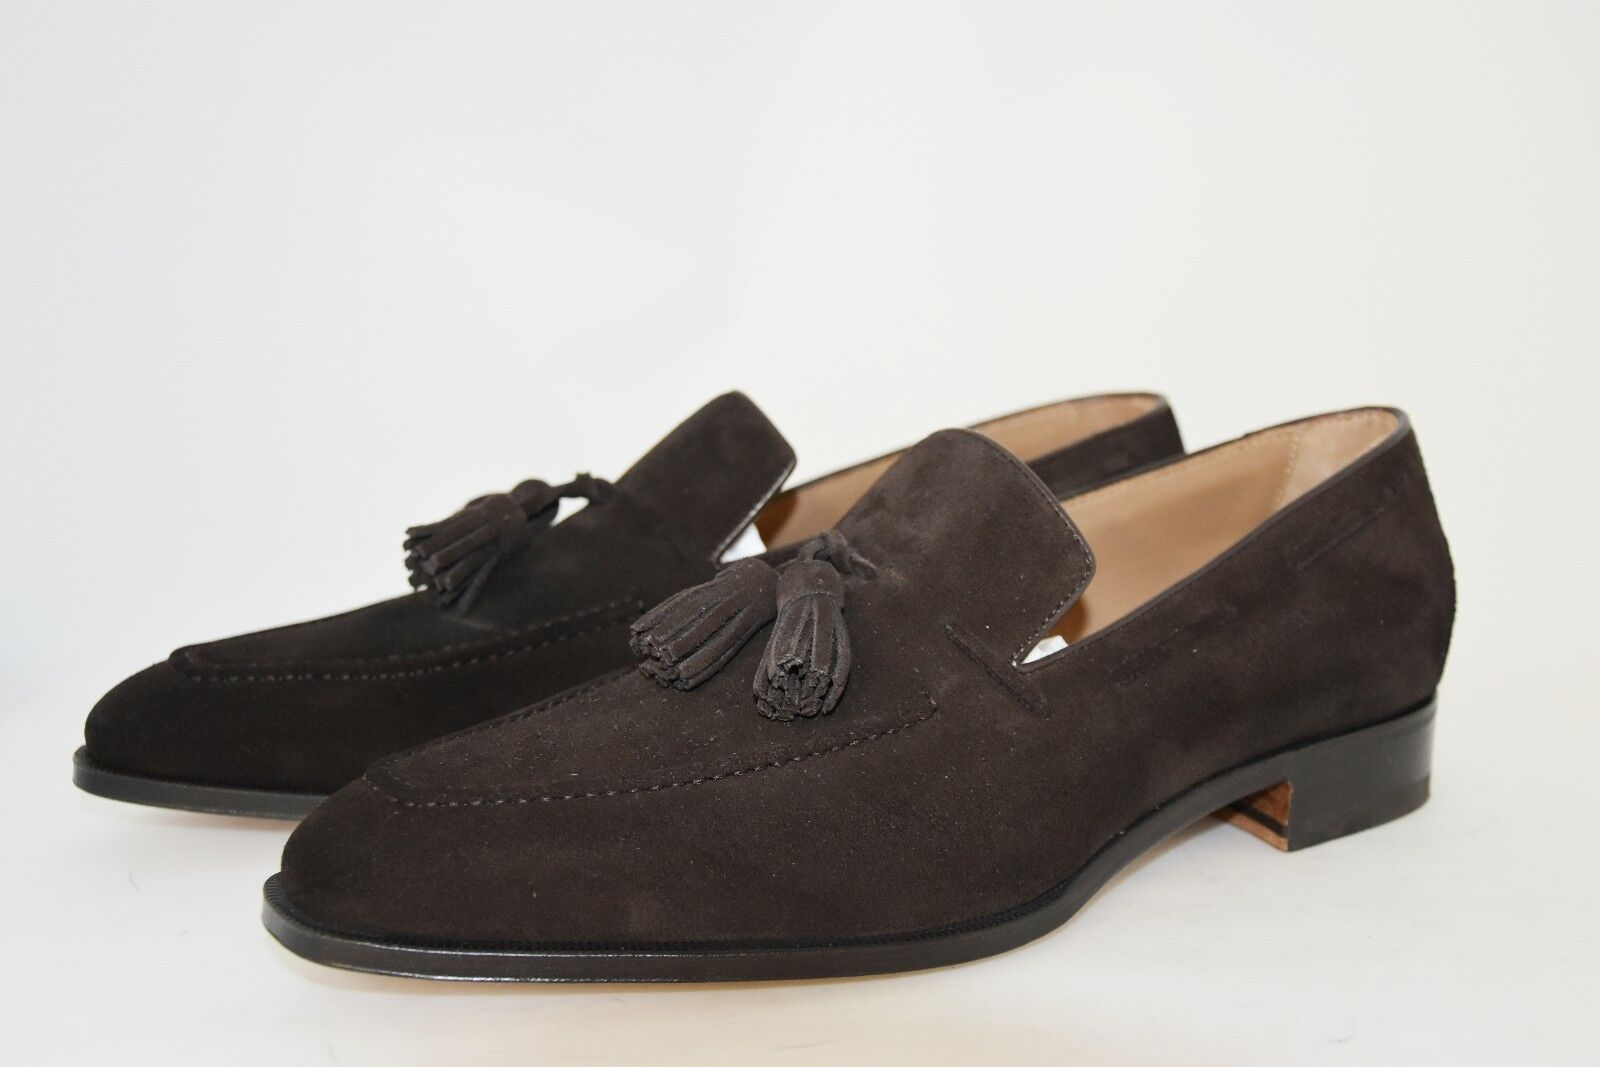 Man - 9eu - 10usa - Tassel - loafer - mocassino - brun foncé